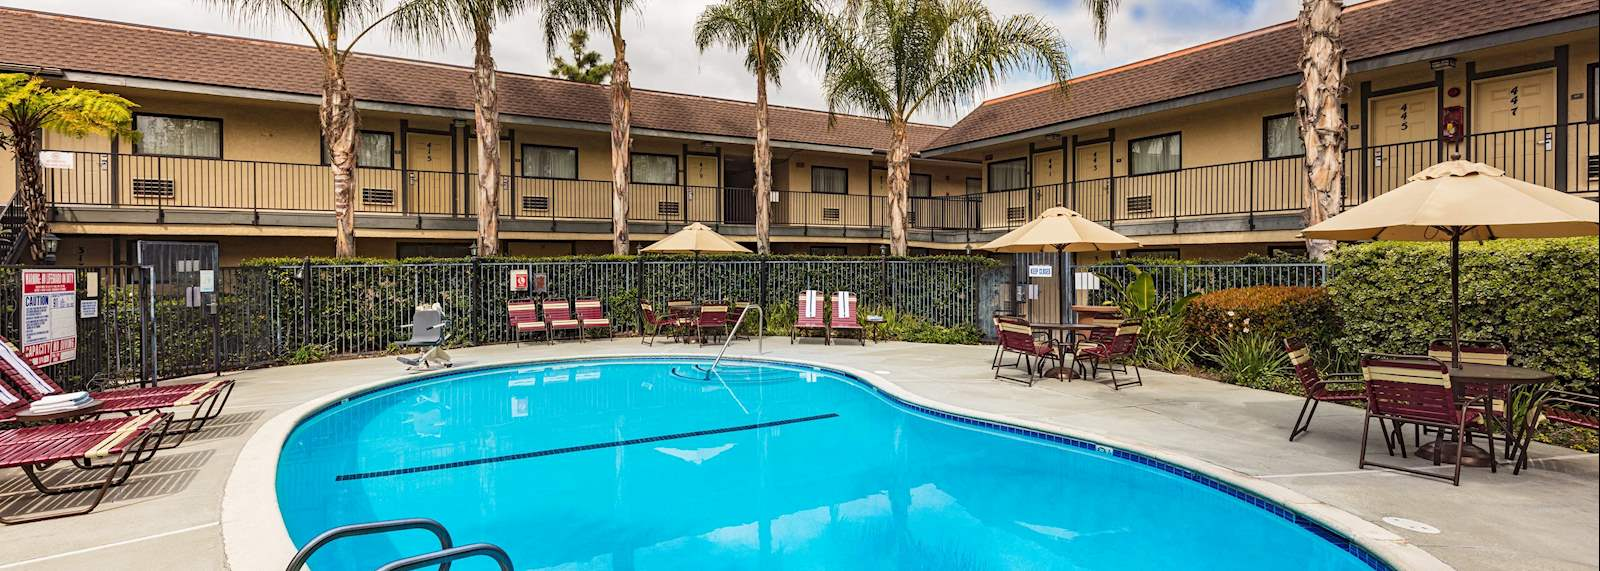 Key inn and suites Tustin - Pool at the lodge